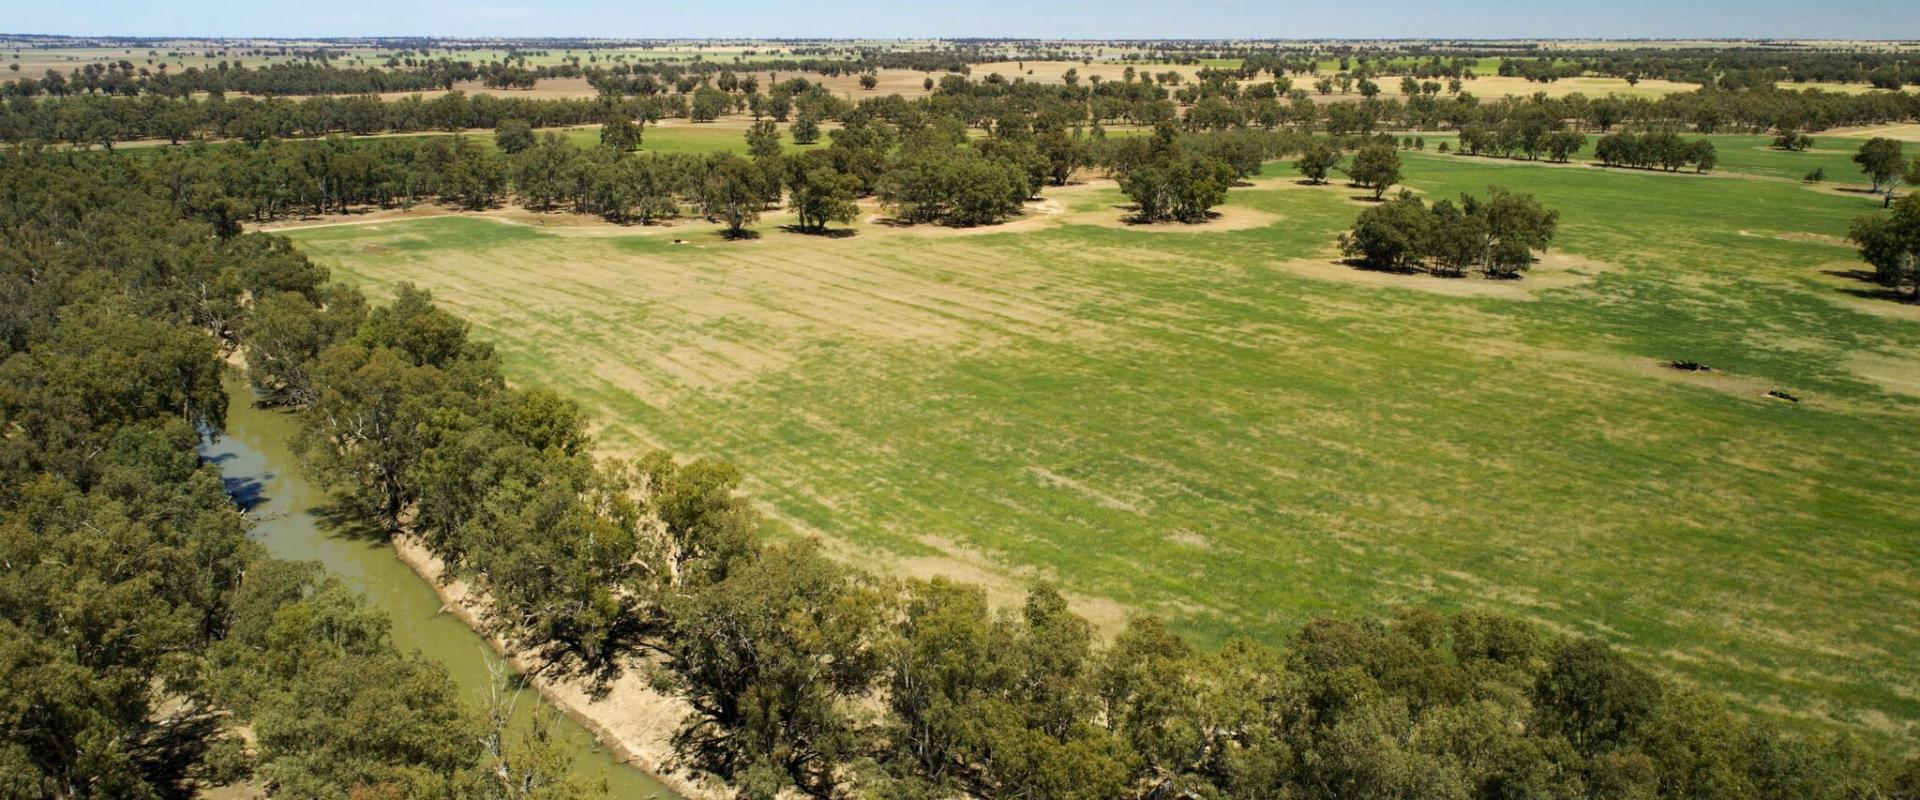 Riverina Livestockts Pty Ltd Crofts   4 Km Old Man Creek Frontage Highway Frontage Irrigation Access Licence